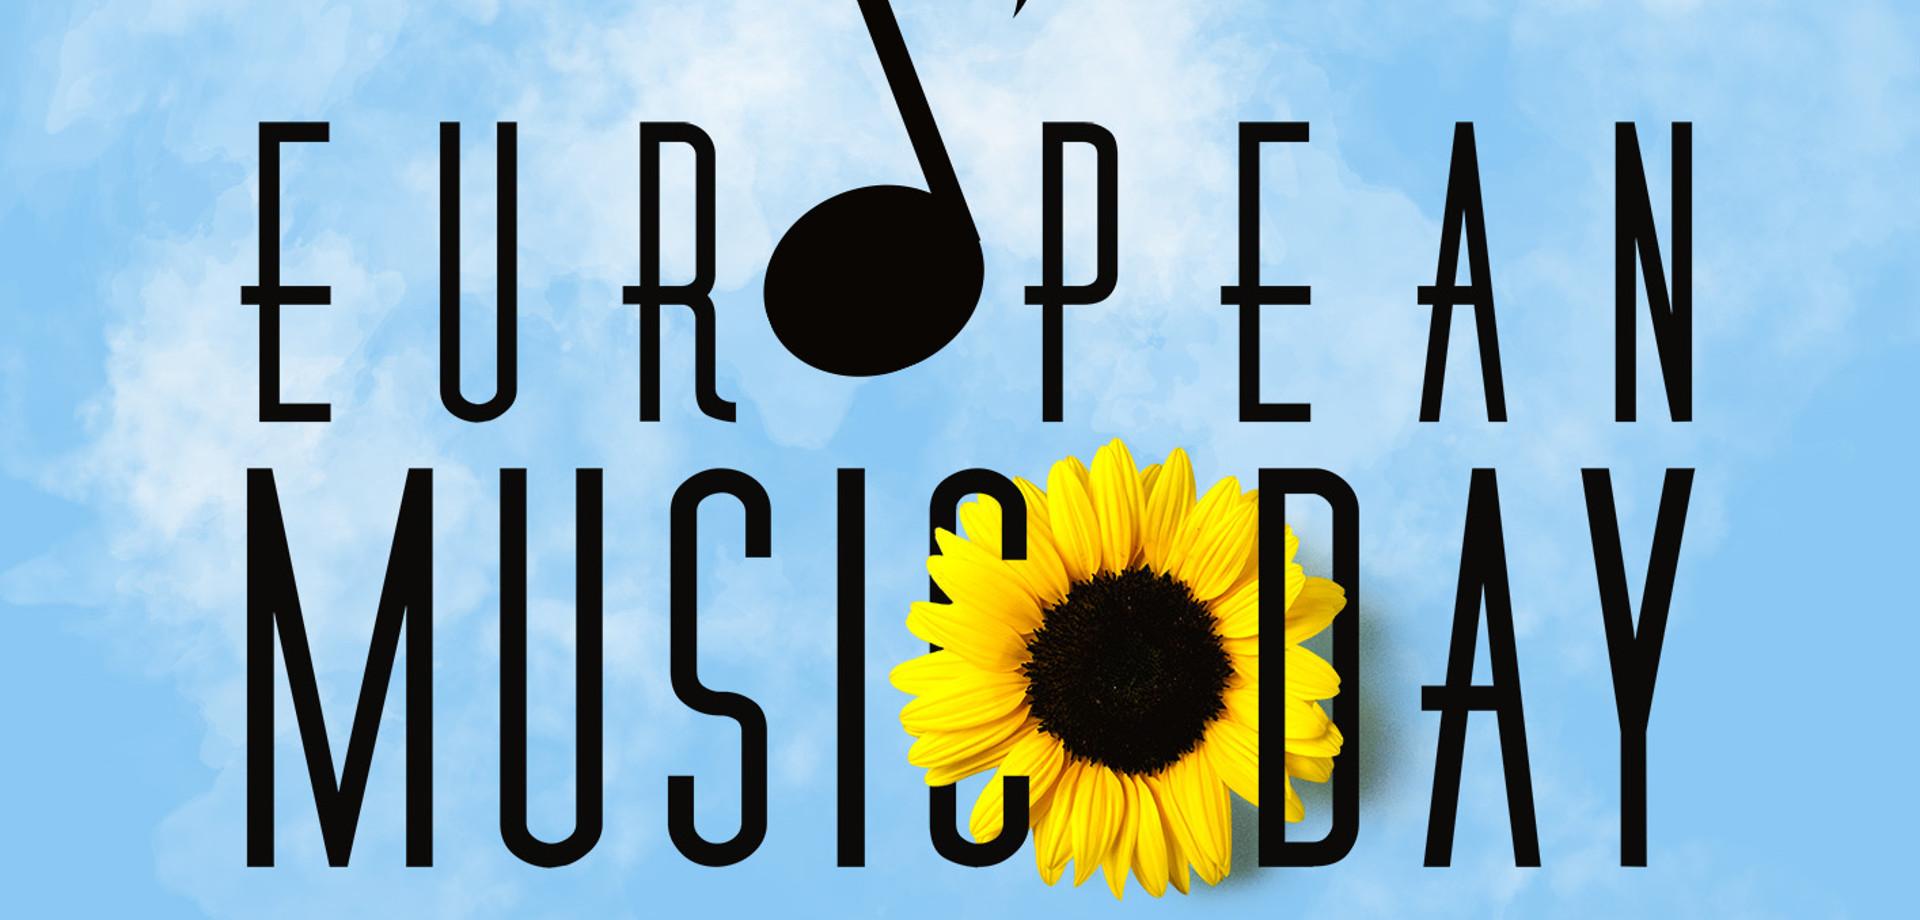 Eυρωπαϊκή Ημέρα Μουσικής